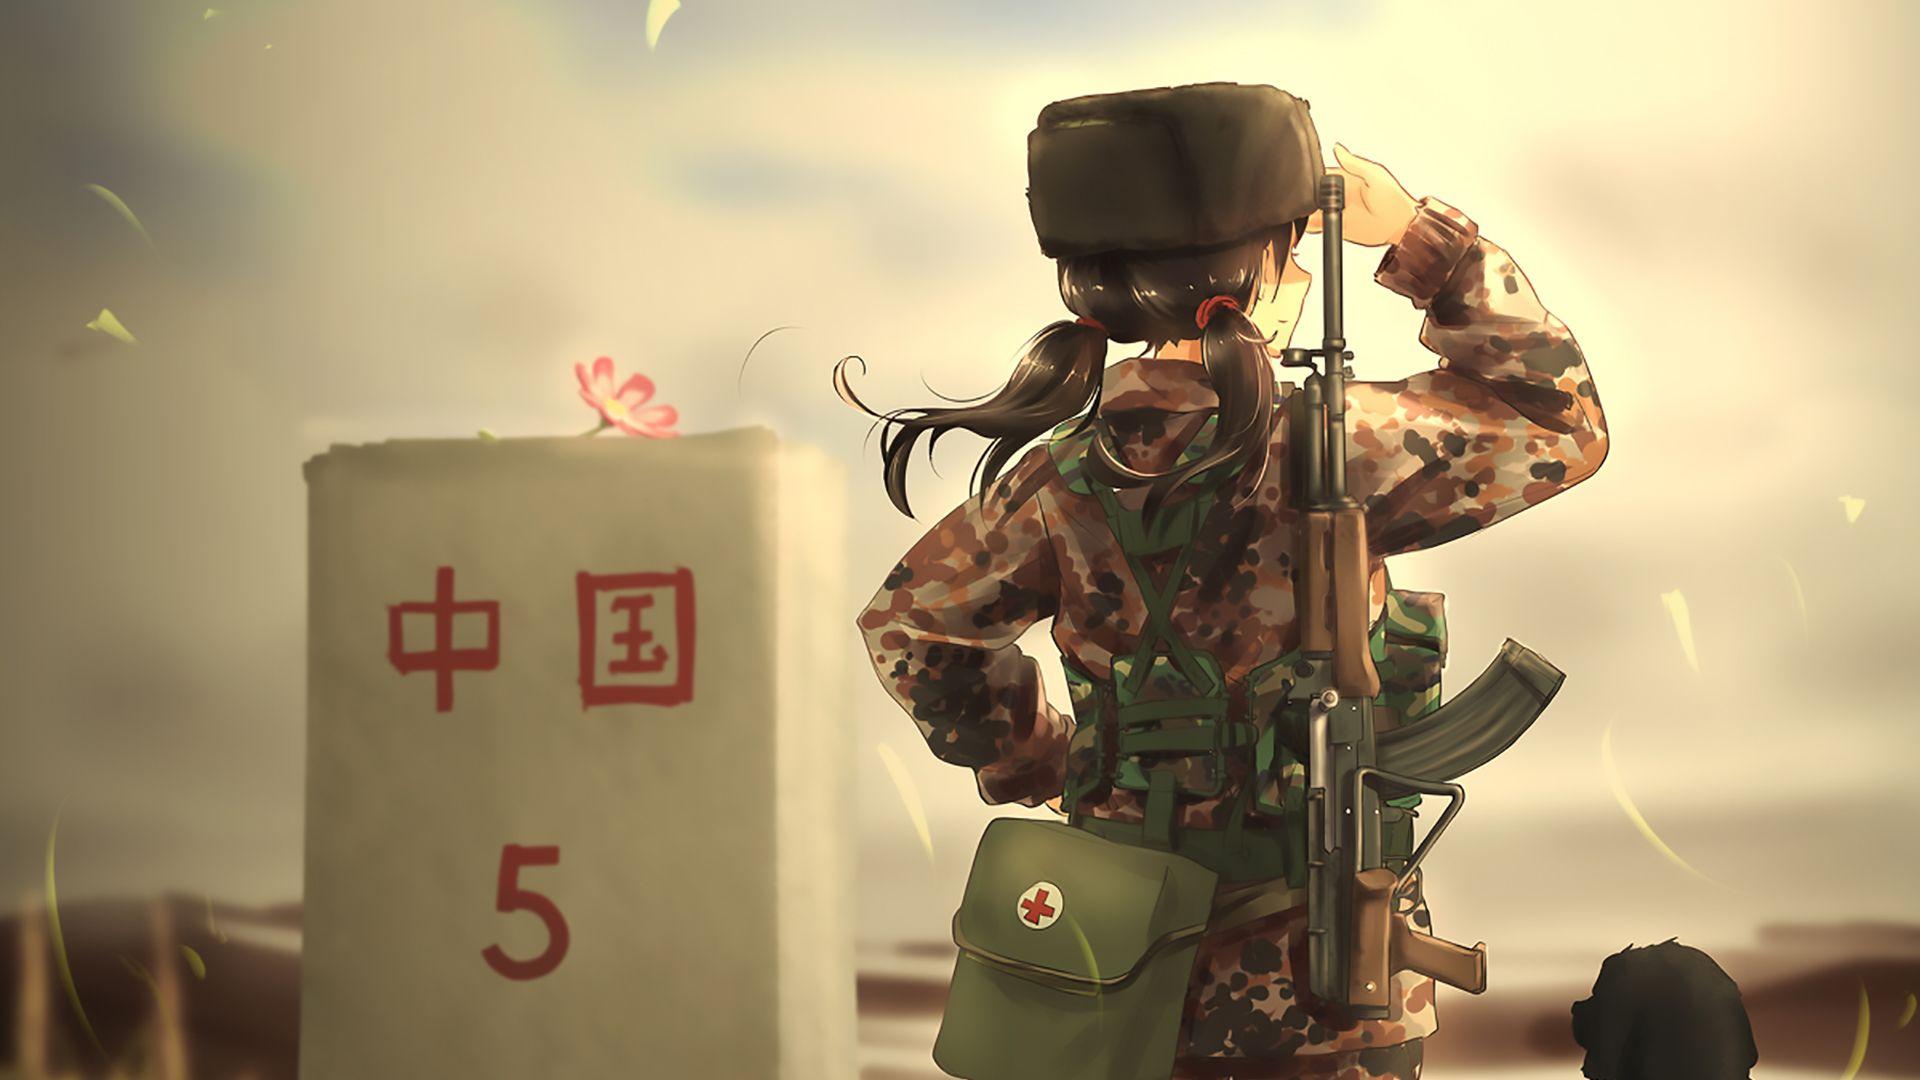 Hd Girl Gun Wallpapers 1080p Desktop Wallpaper Soldier Army Anime Girl Dog Hd Image